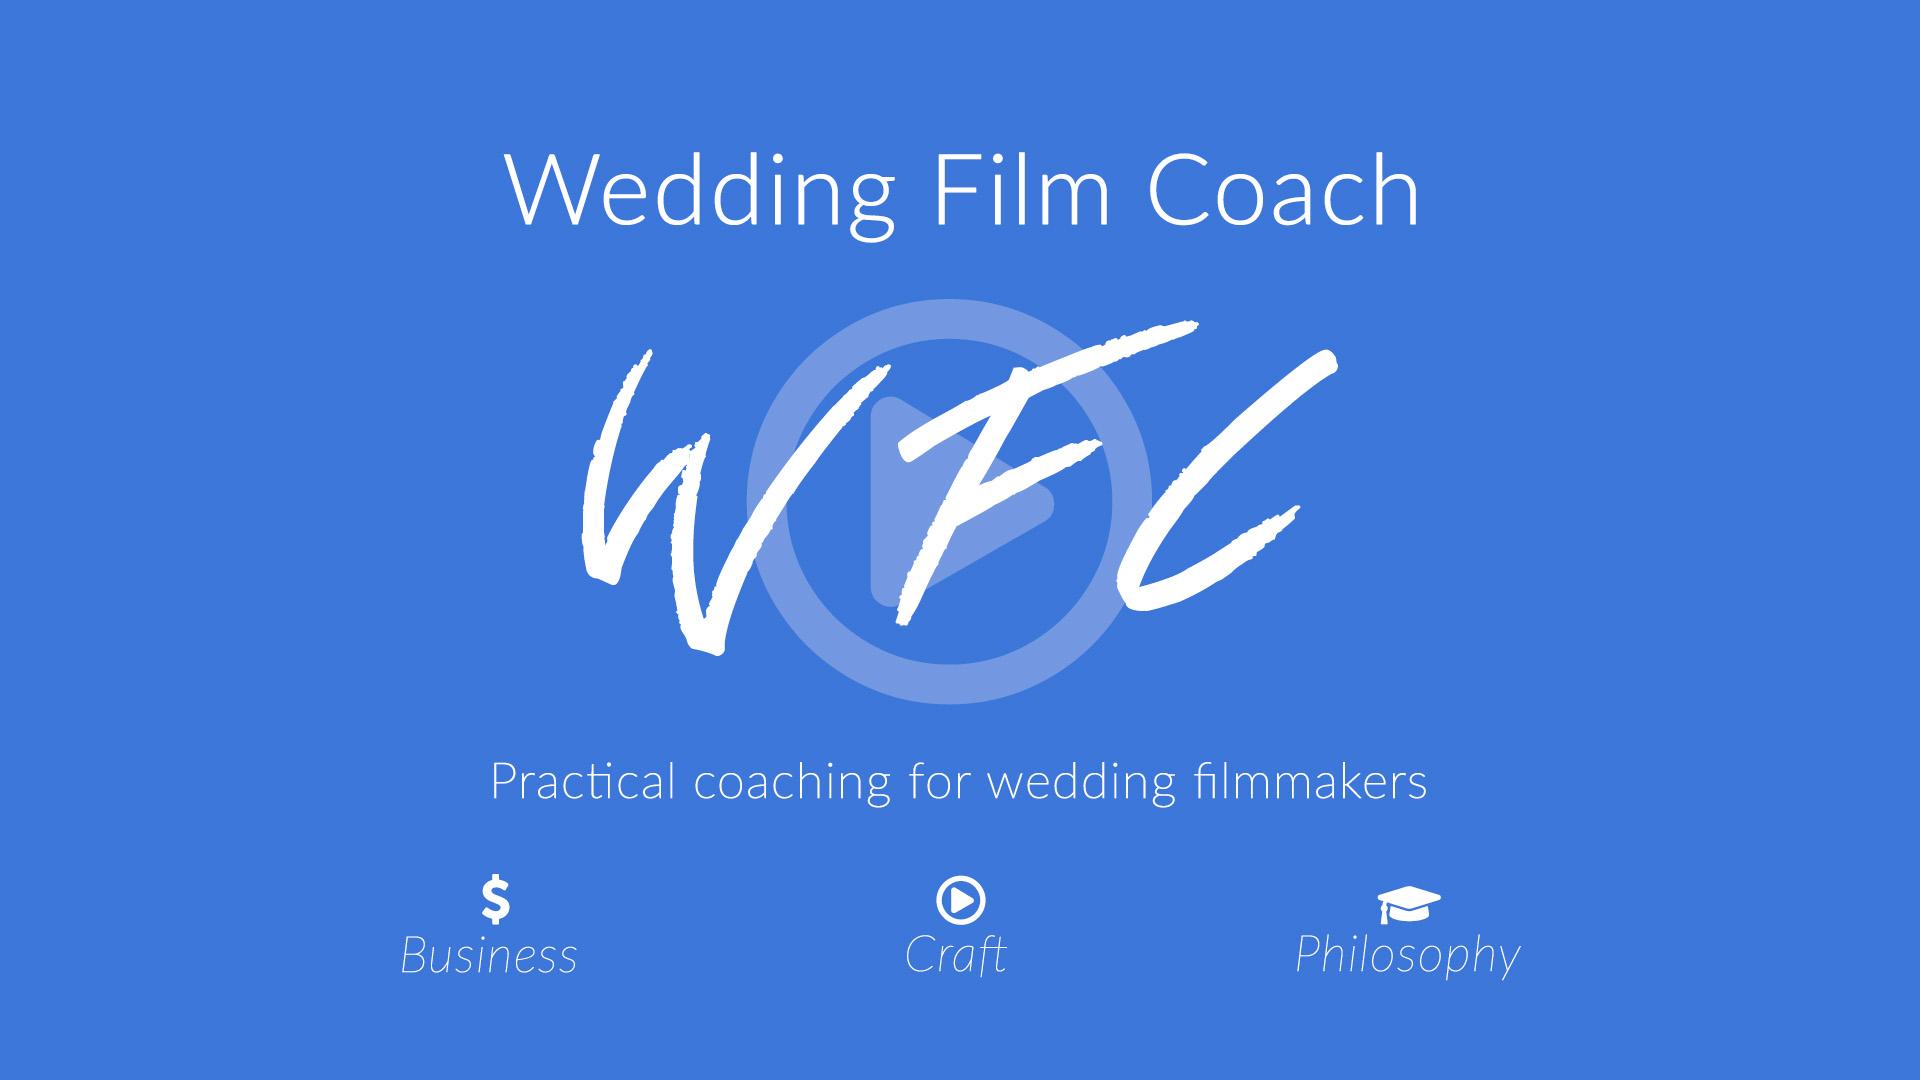 wedding film coach landing page graphic.jpg